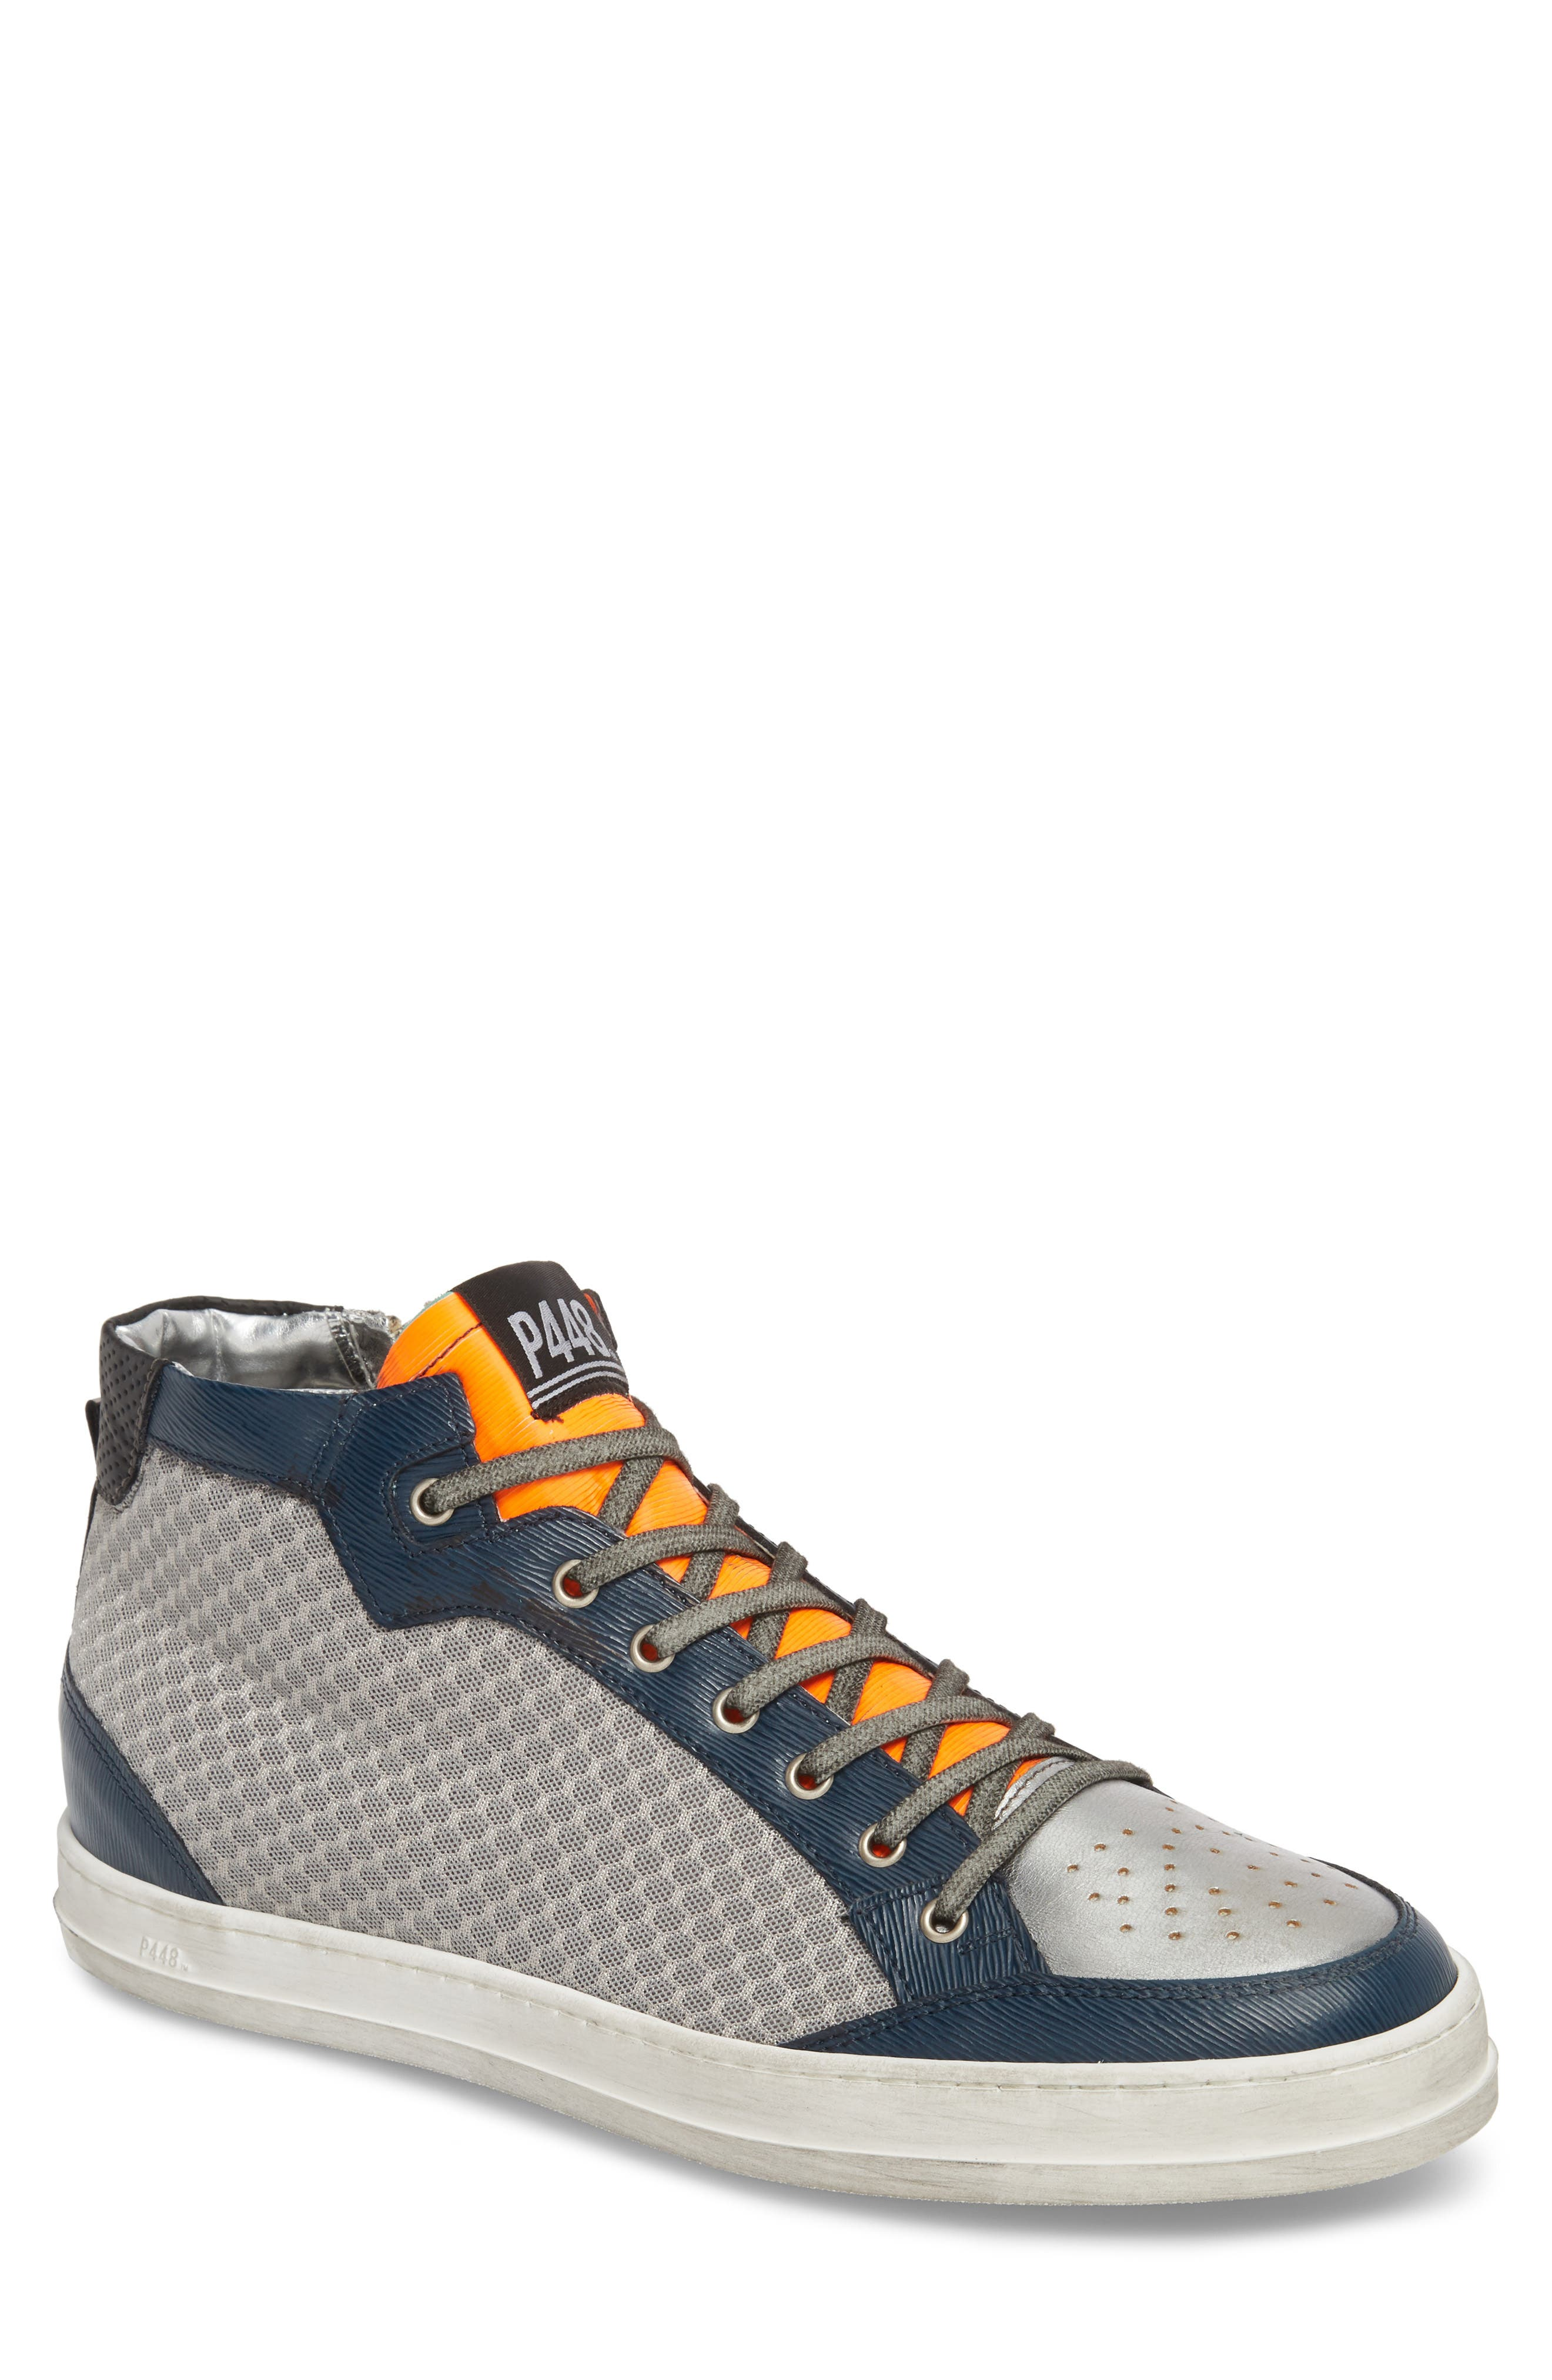 P448 Love High Top Sneaker (Men)